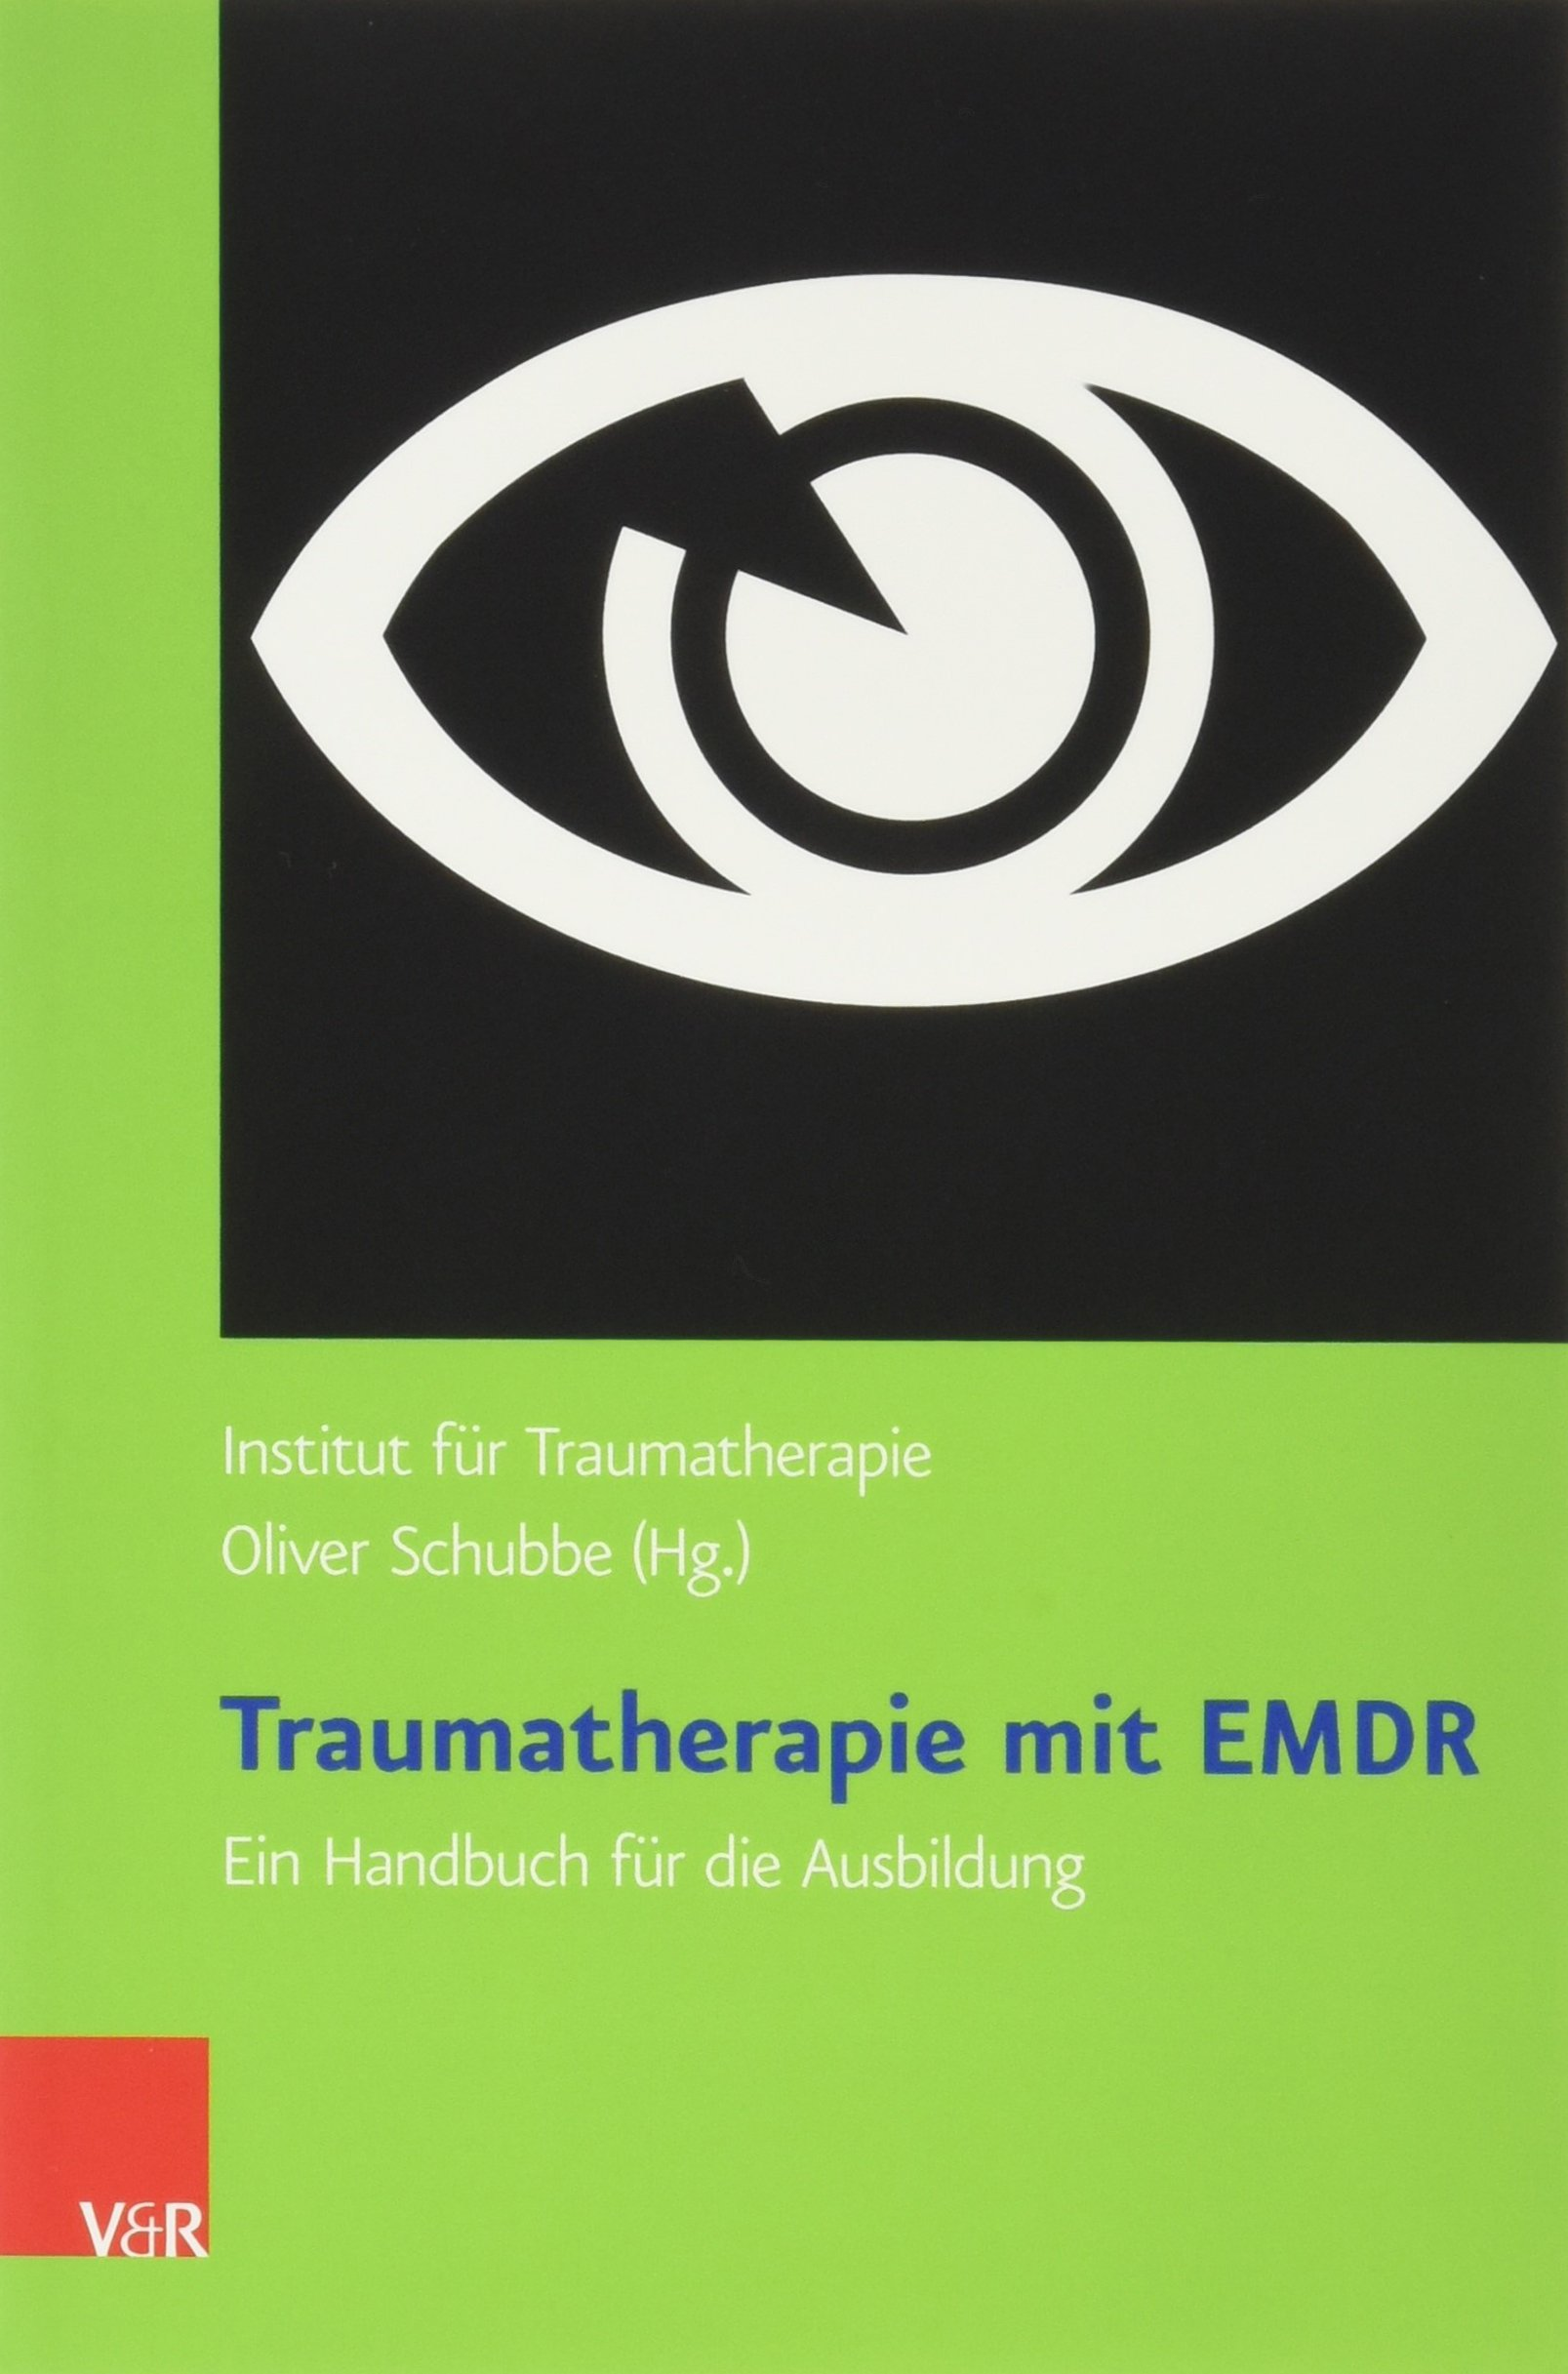 traumatherapie-mit-emdr-traumatherapie-mit-emdr-m-dvd-video